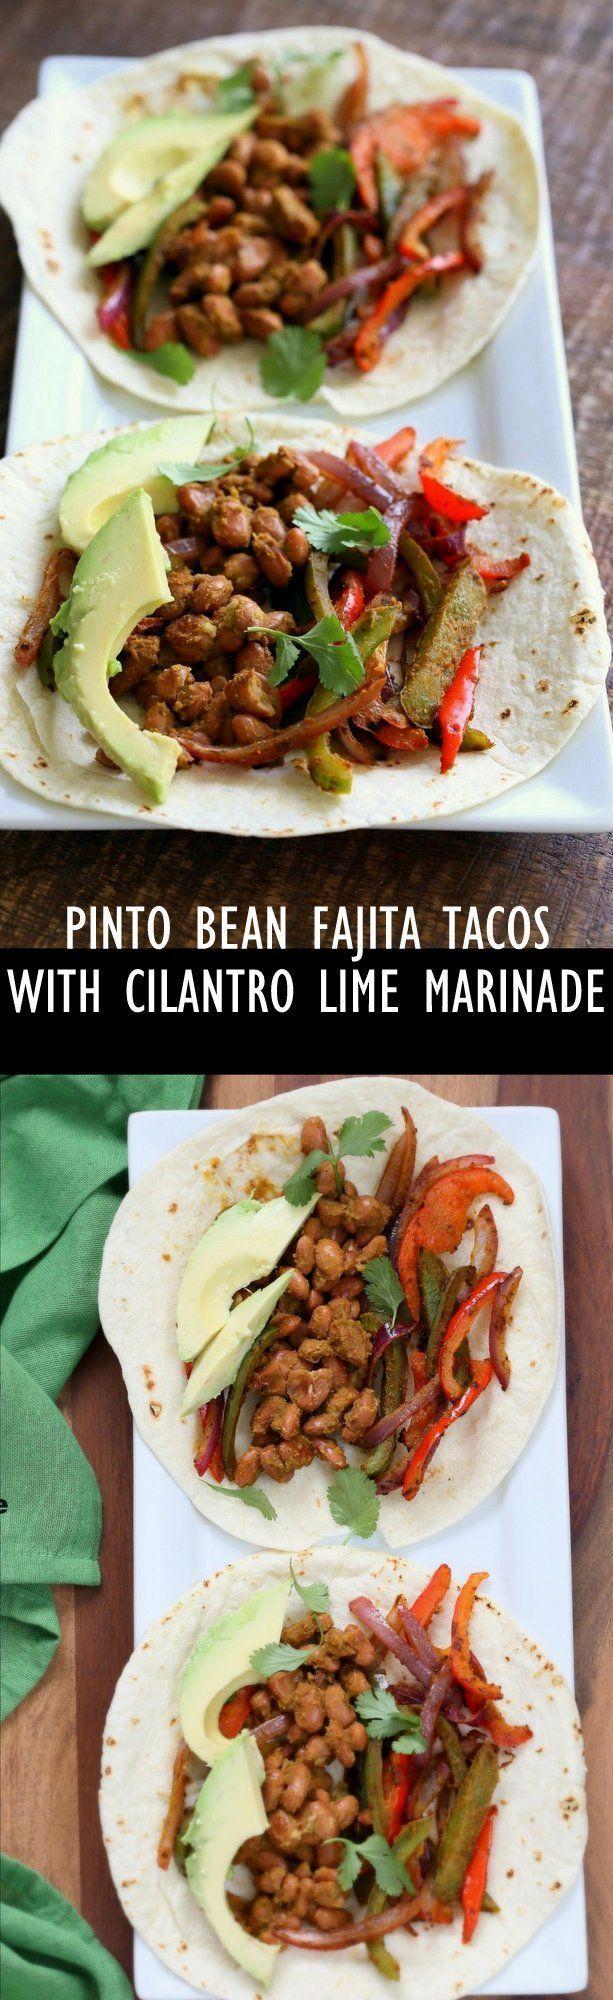 Veggie Pinto Bean Fajita Tacos with Cilantro Chile Marinade. Amazing Fajita Marinade for veggies and Beans. Vegan Gluten-free Soy-free Vegetarian Fajita Recipe | http://VeganRicha.com